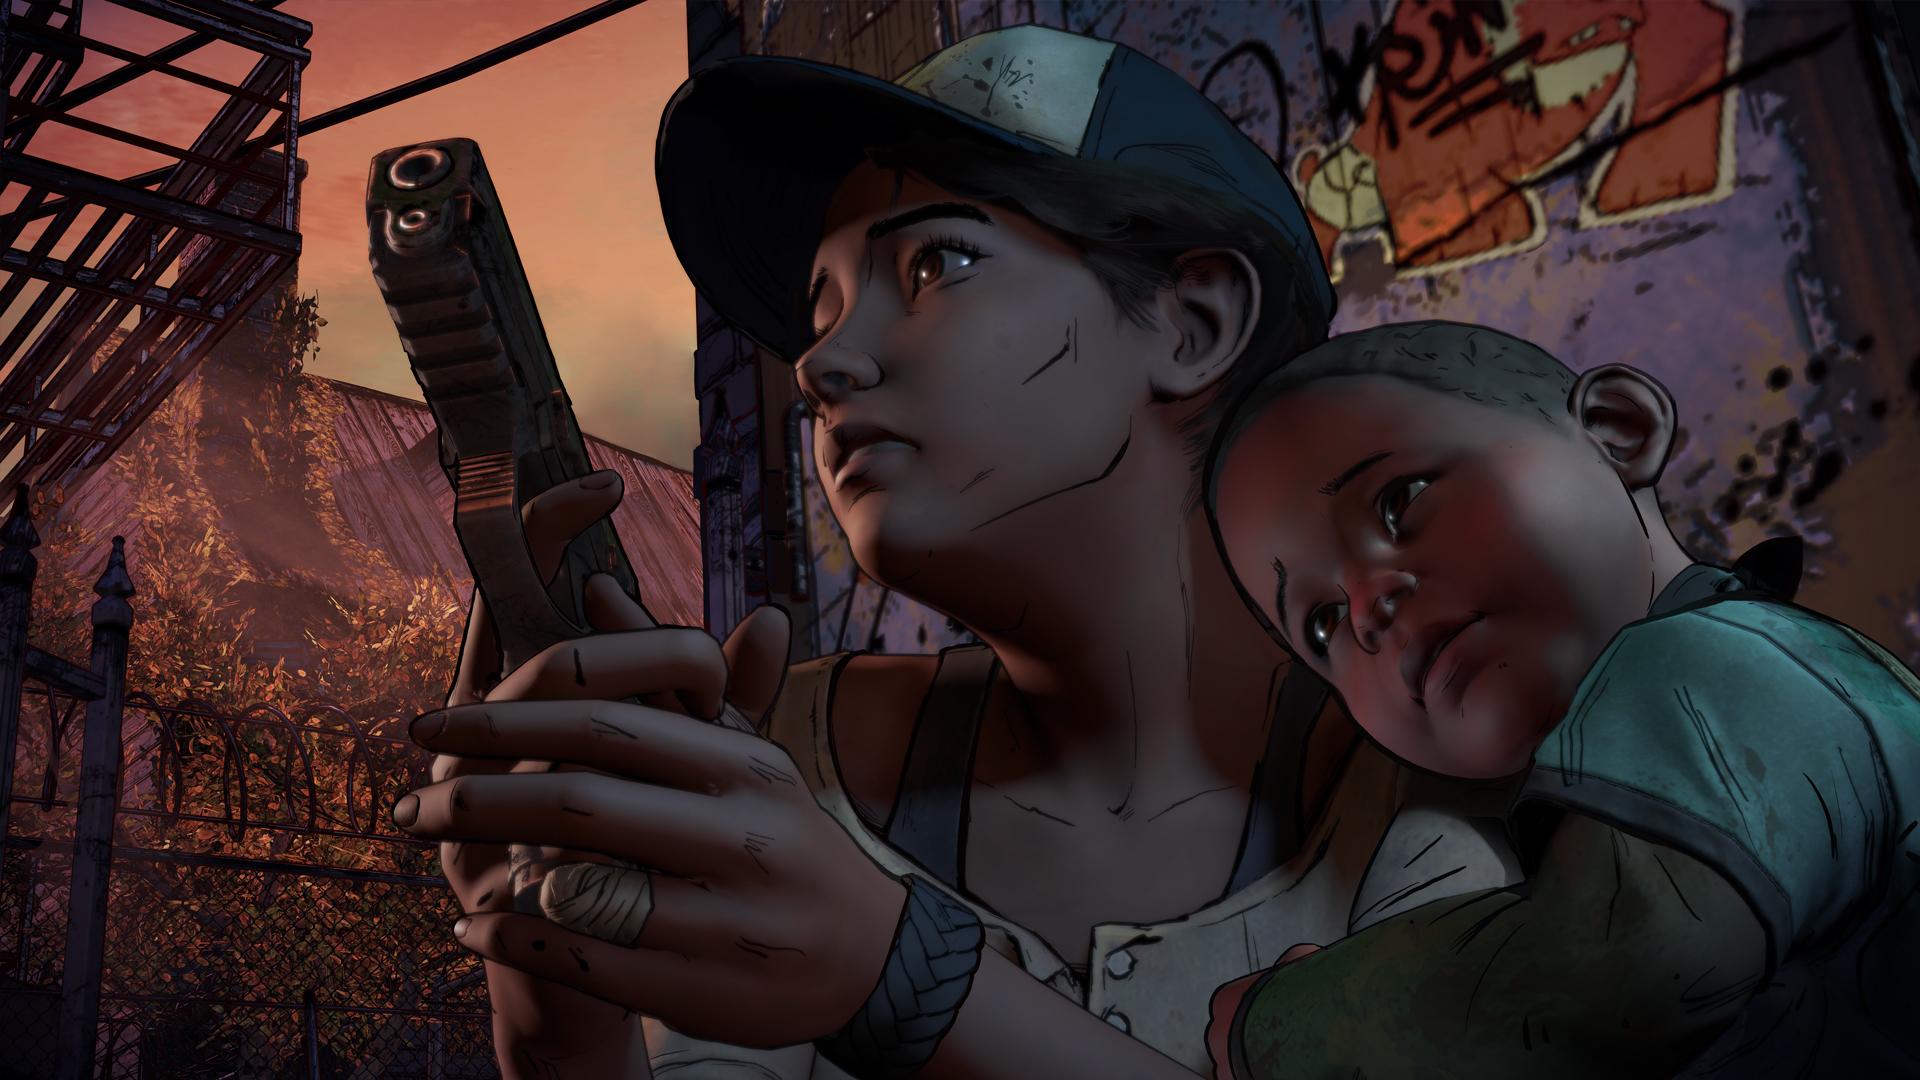 Třetí série The Walking Dead na nových screenshotech 127536